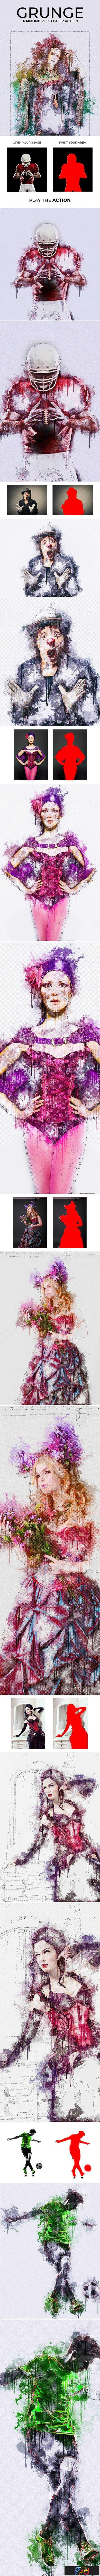 1805231 Grunge Painting Photoshop Action 21724719 1